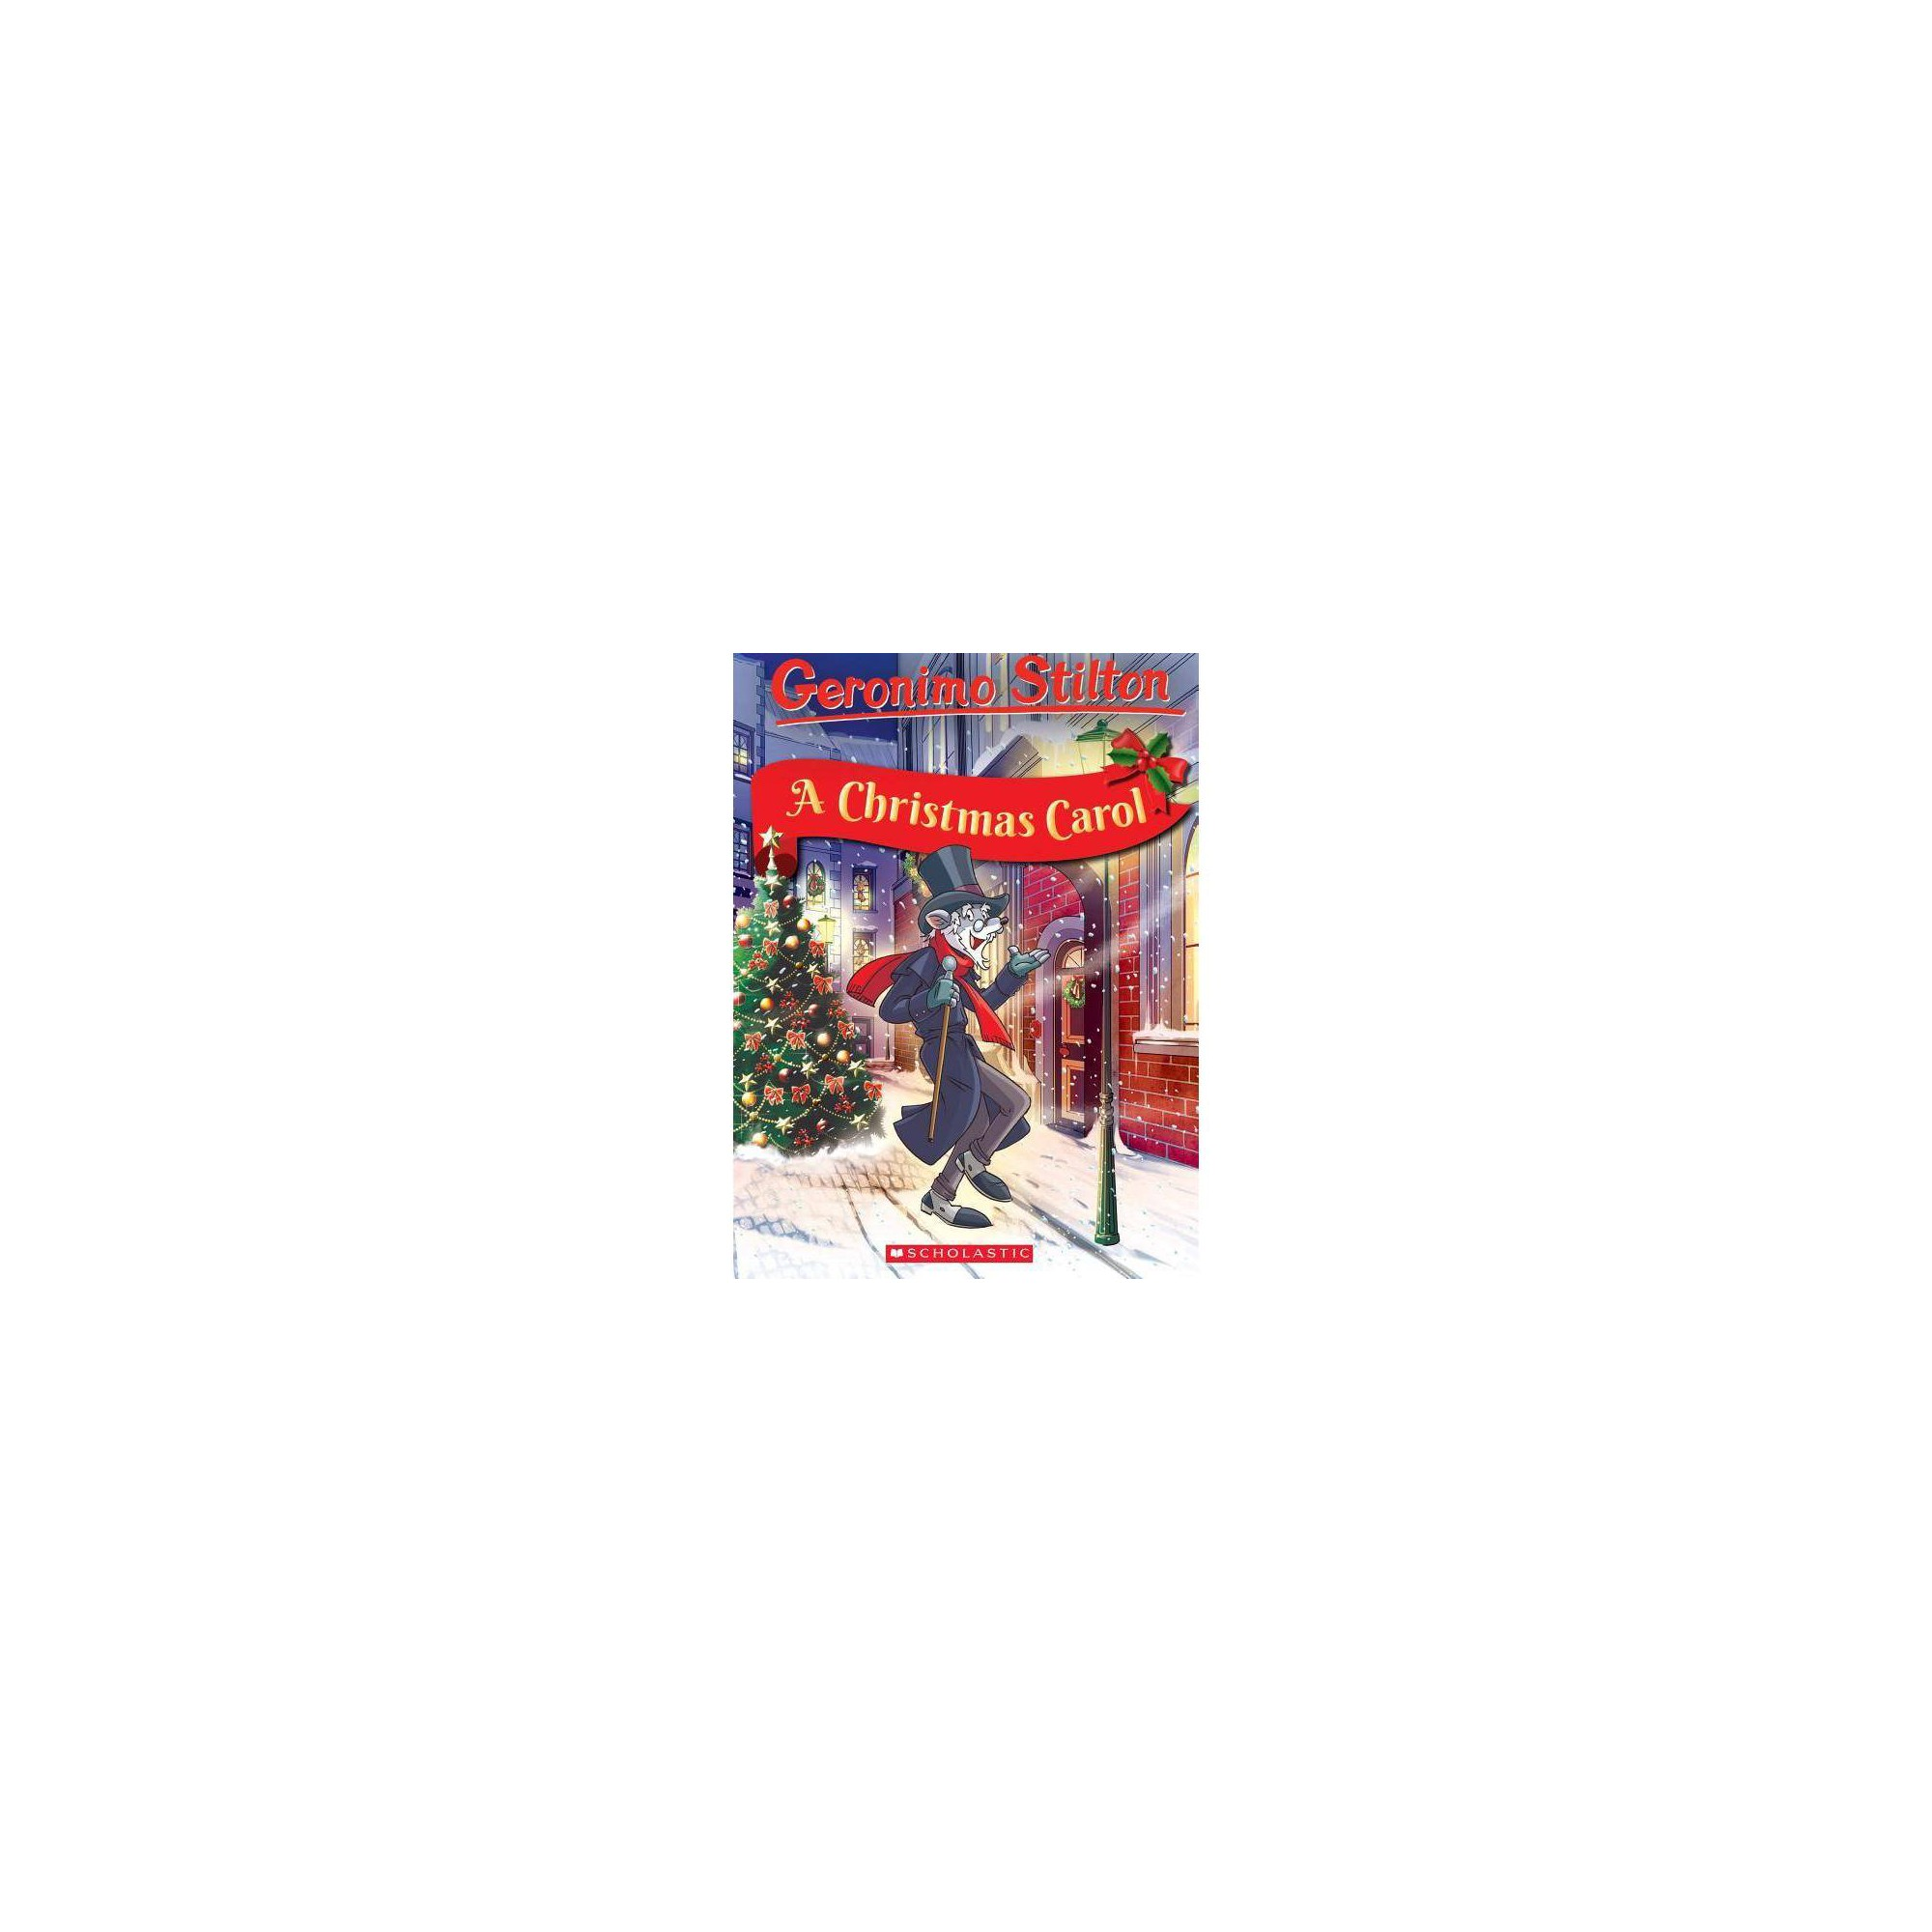 Geronimo Stilton Retells the Classics: A Christmas Carol - (Geronimo Stilton Classic Tales) (Hardcover)